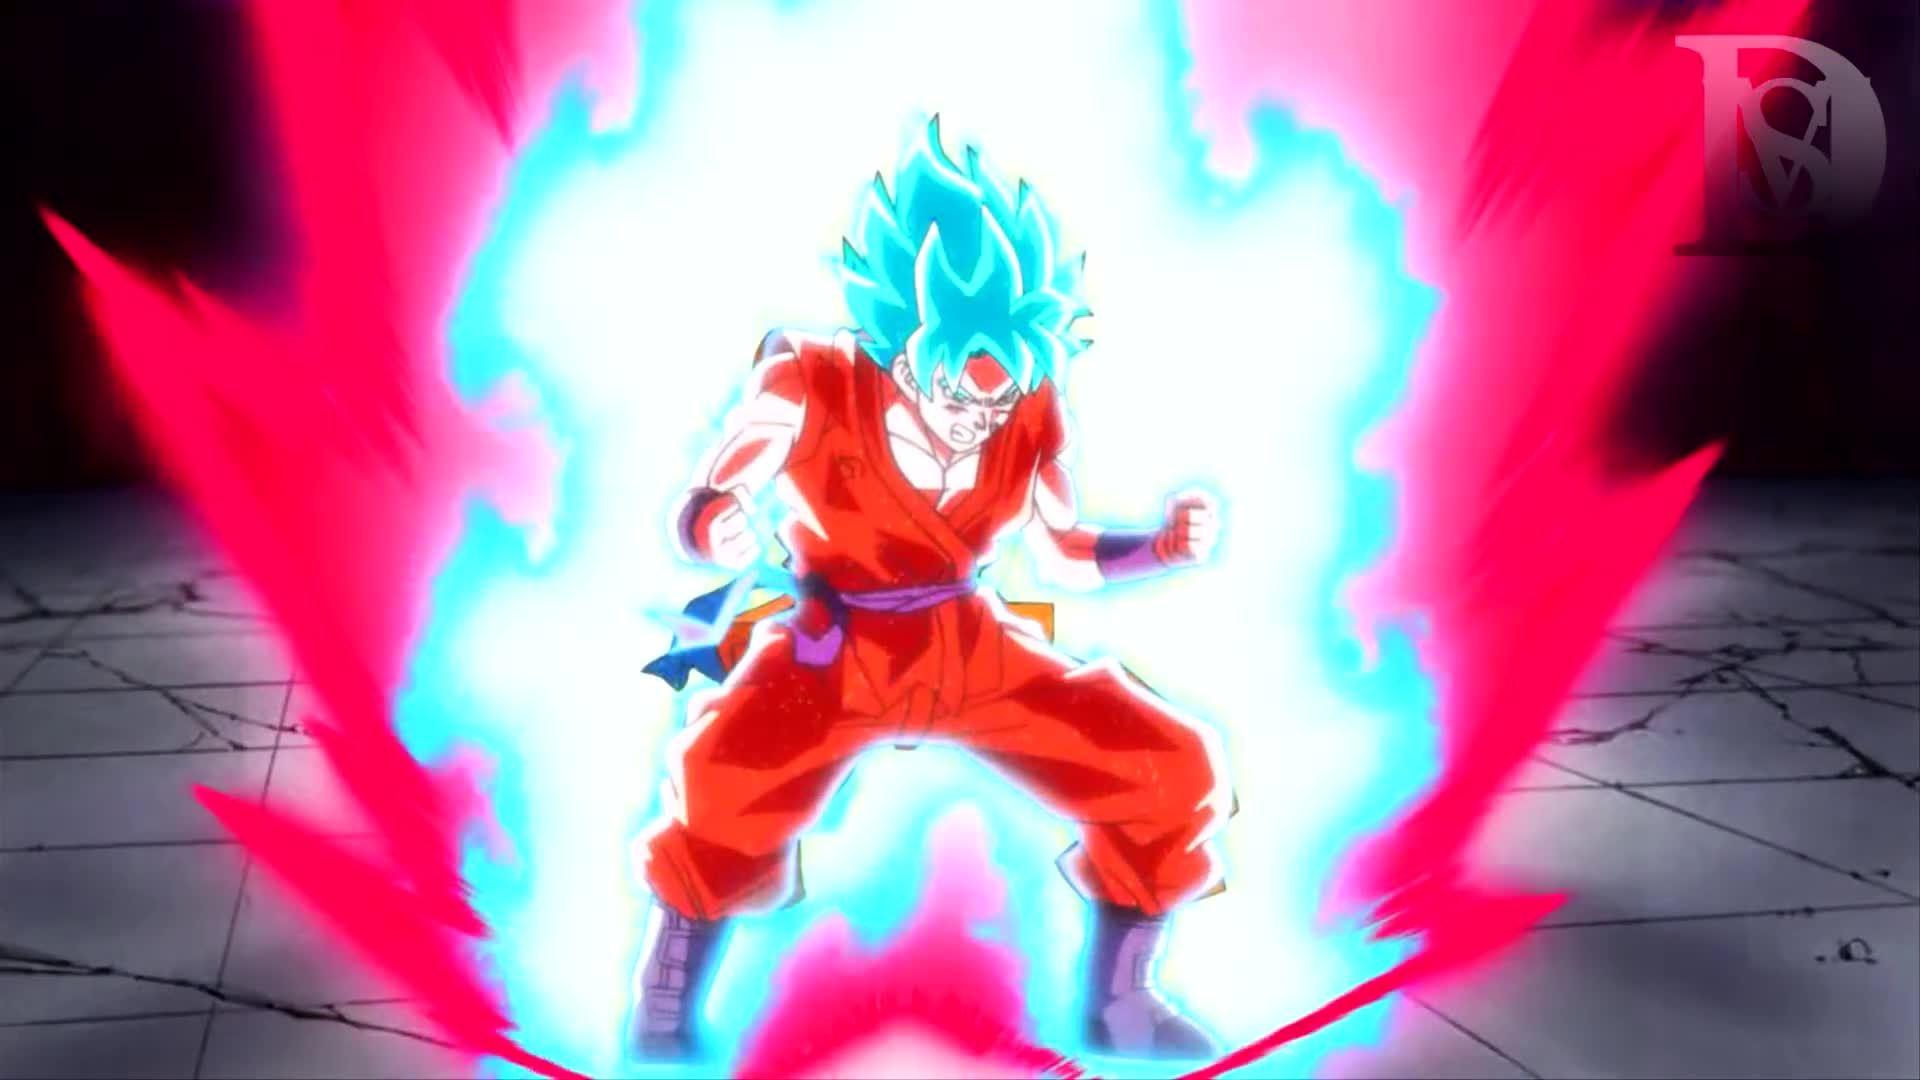 Goku Super Saiyan Blue Kaioken Wallpaper Posted By Michelle Sellers